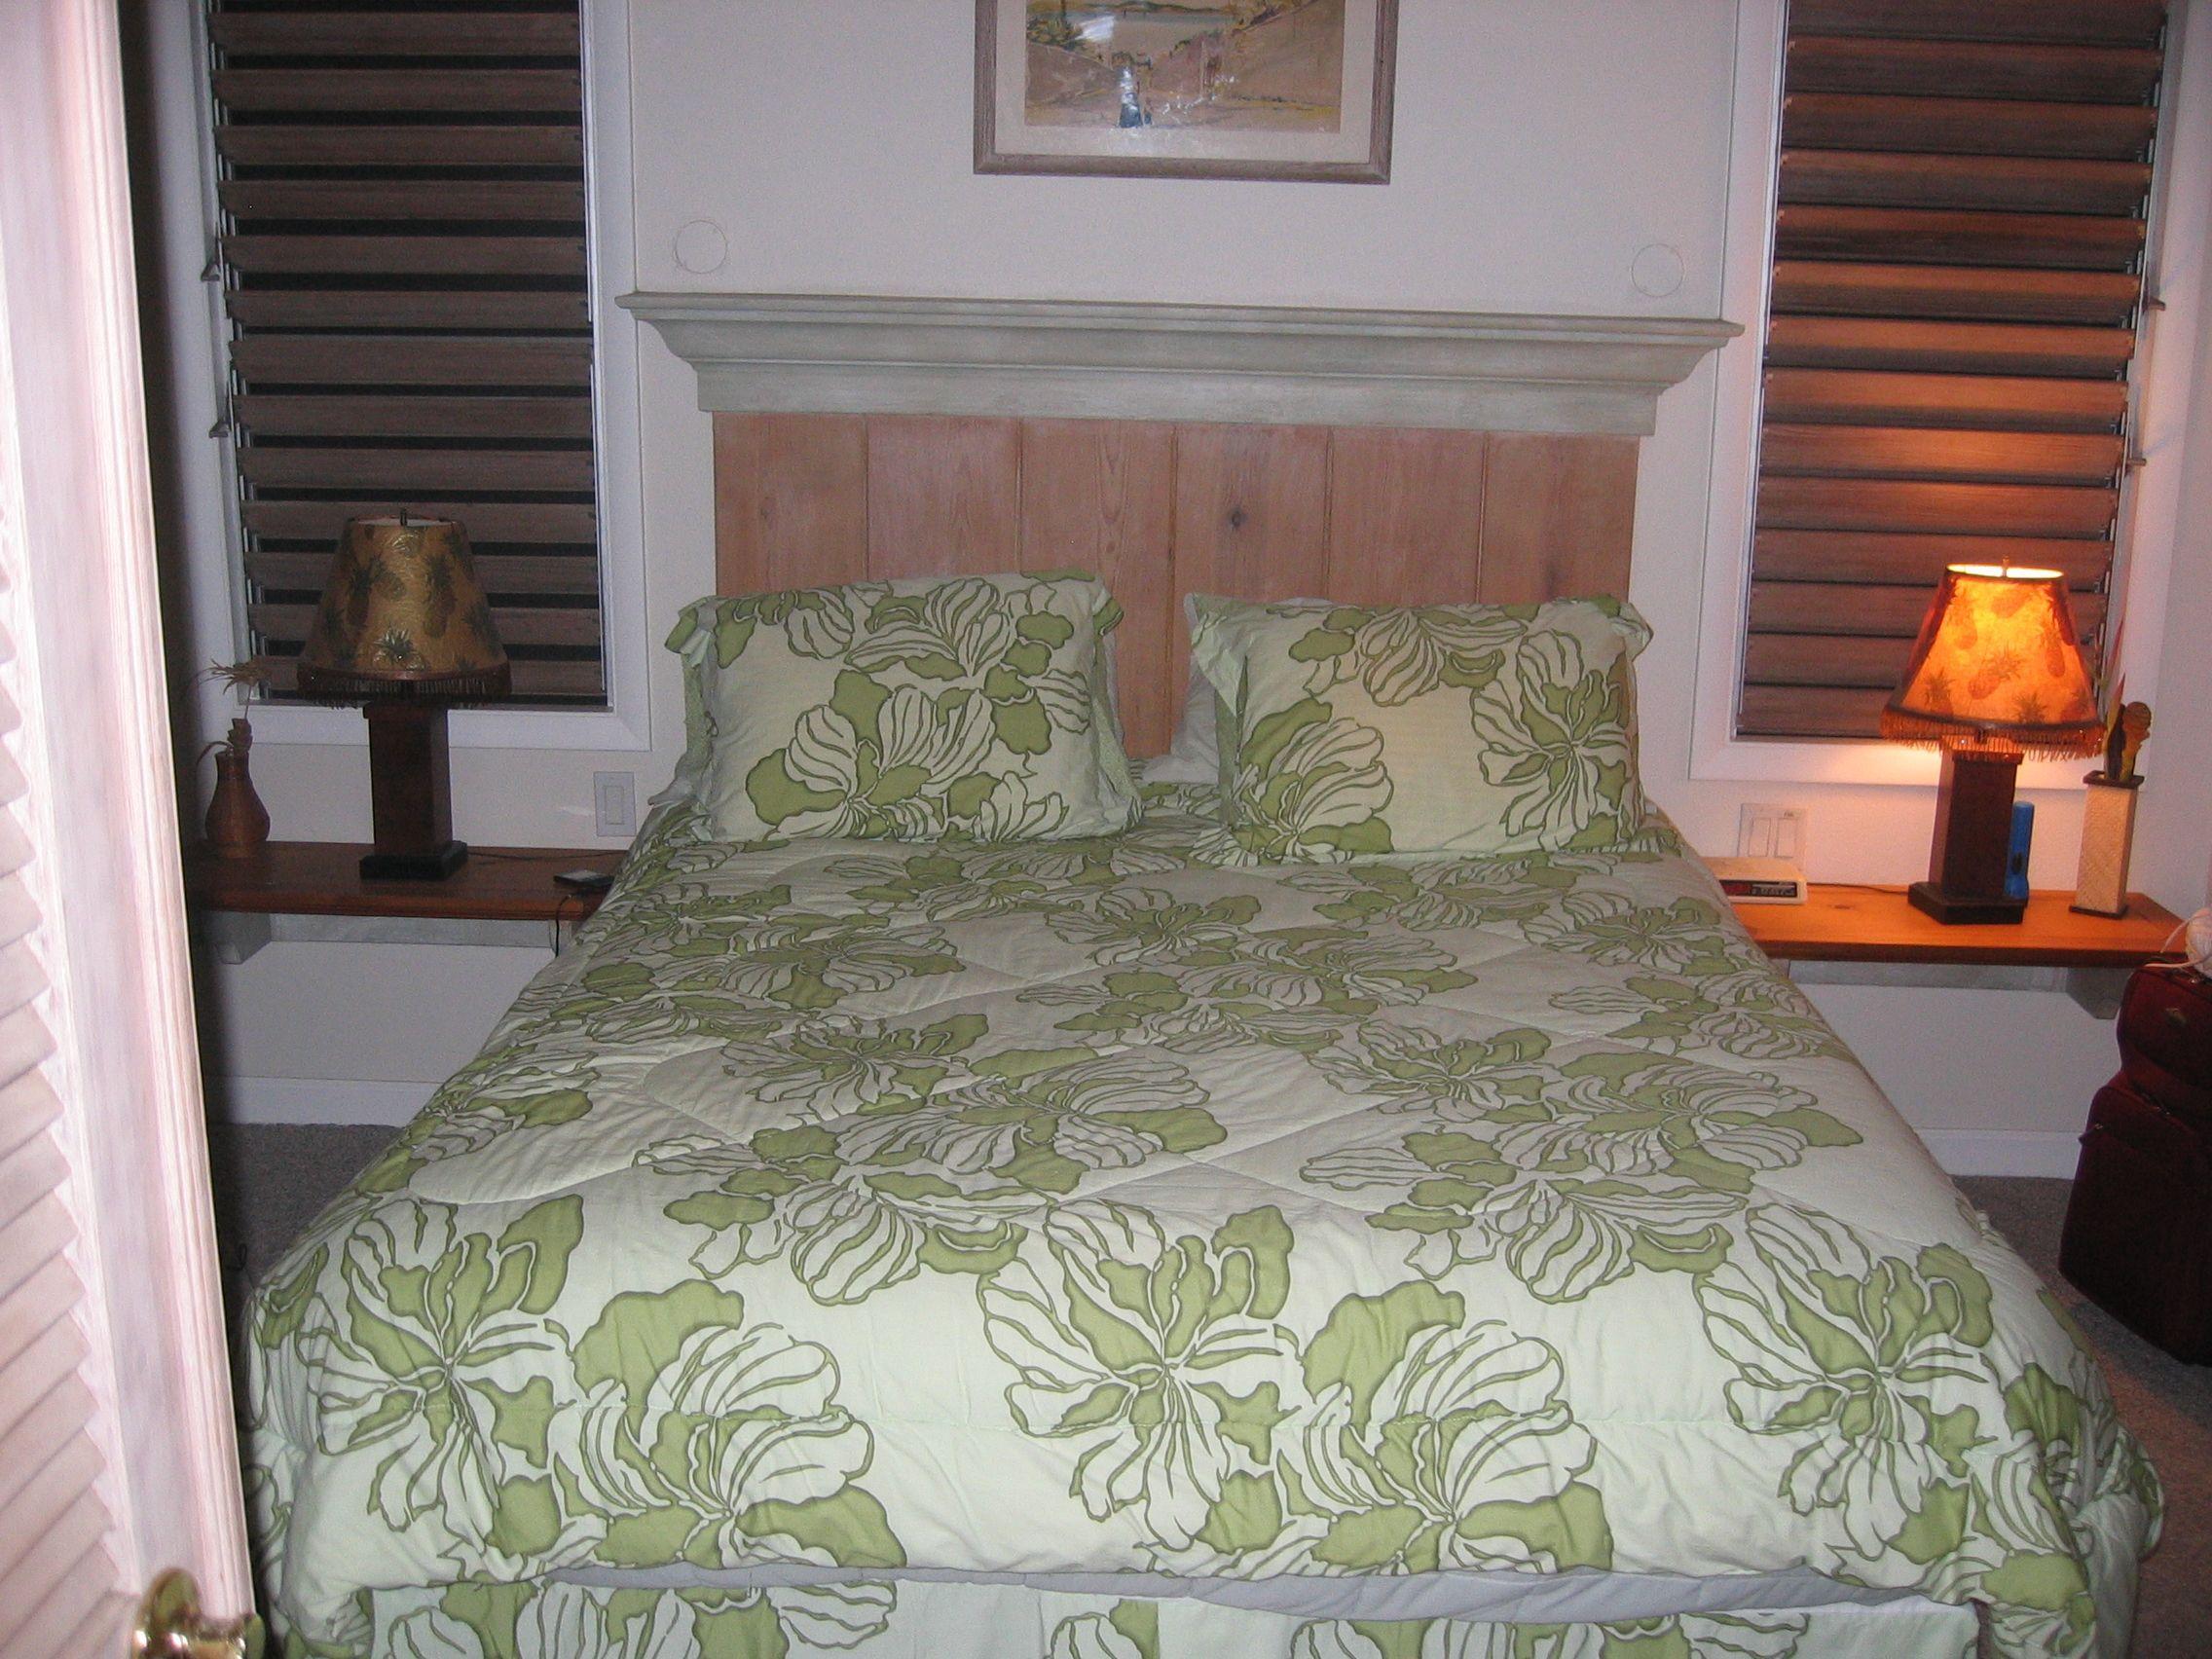 Kakalina's Bed and Breakfast